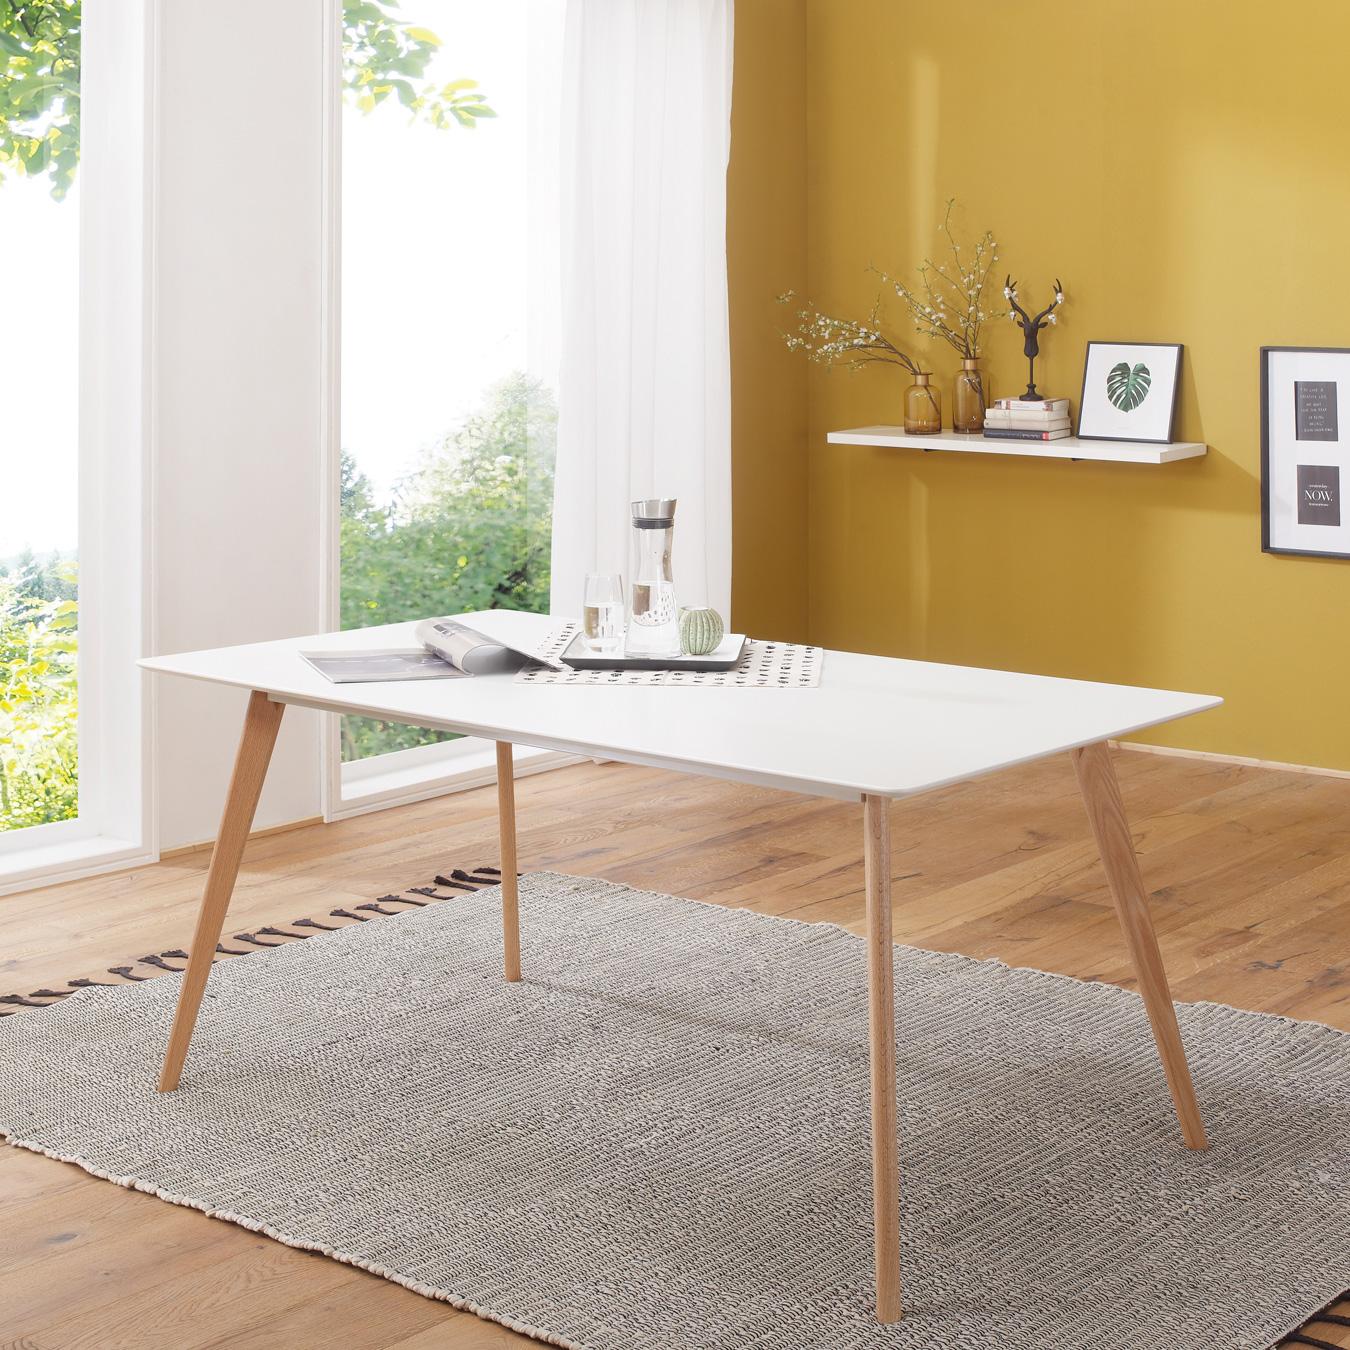 Jídelní stůl Scanio, 180 cm, bílá/dub